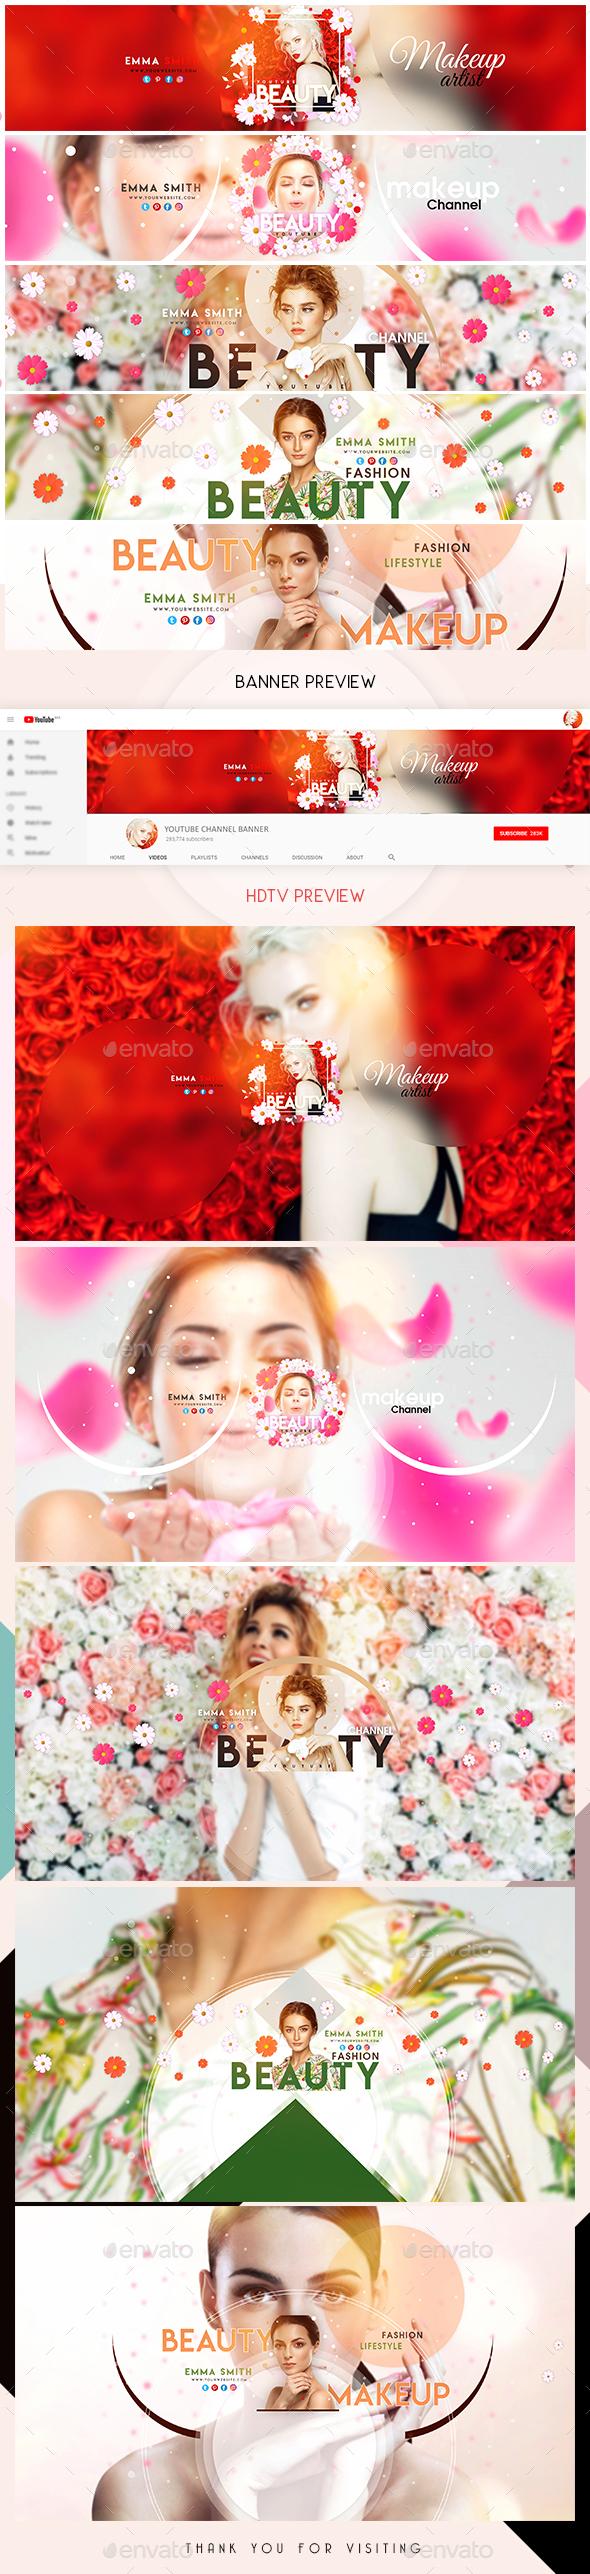 5 Beauty YouTube Banners - YouTube Social Media